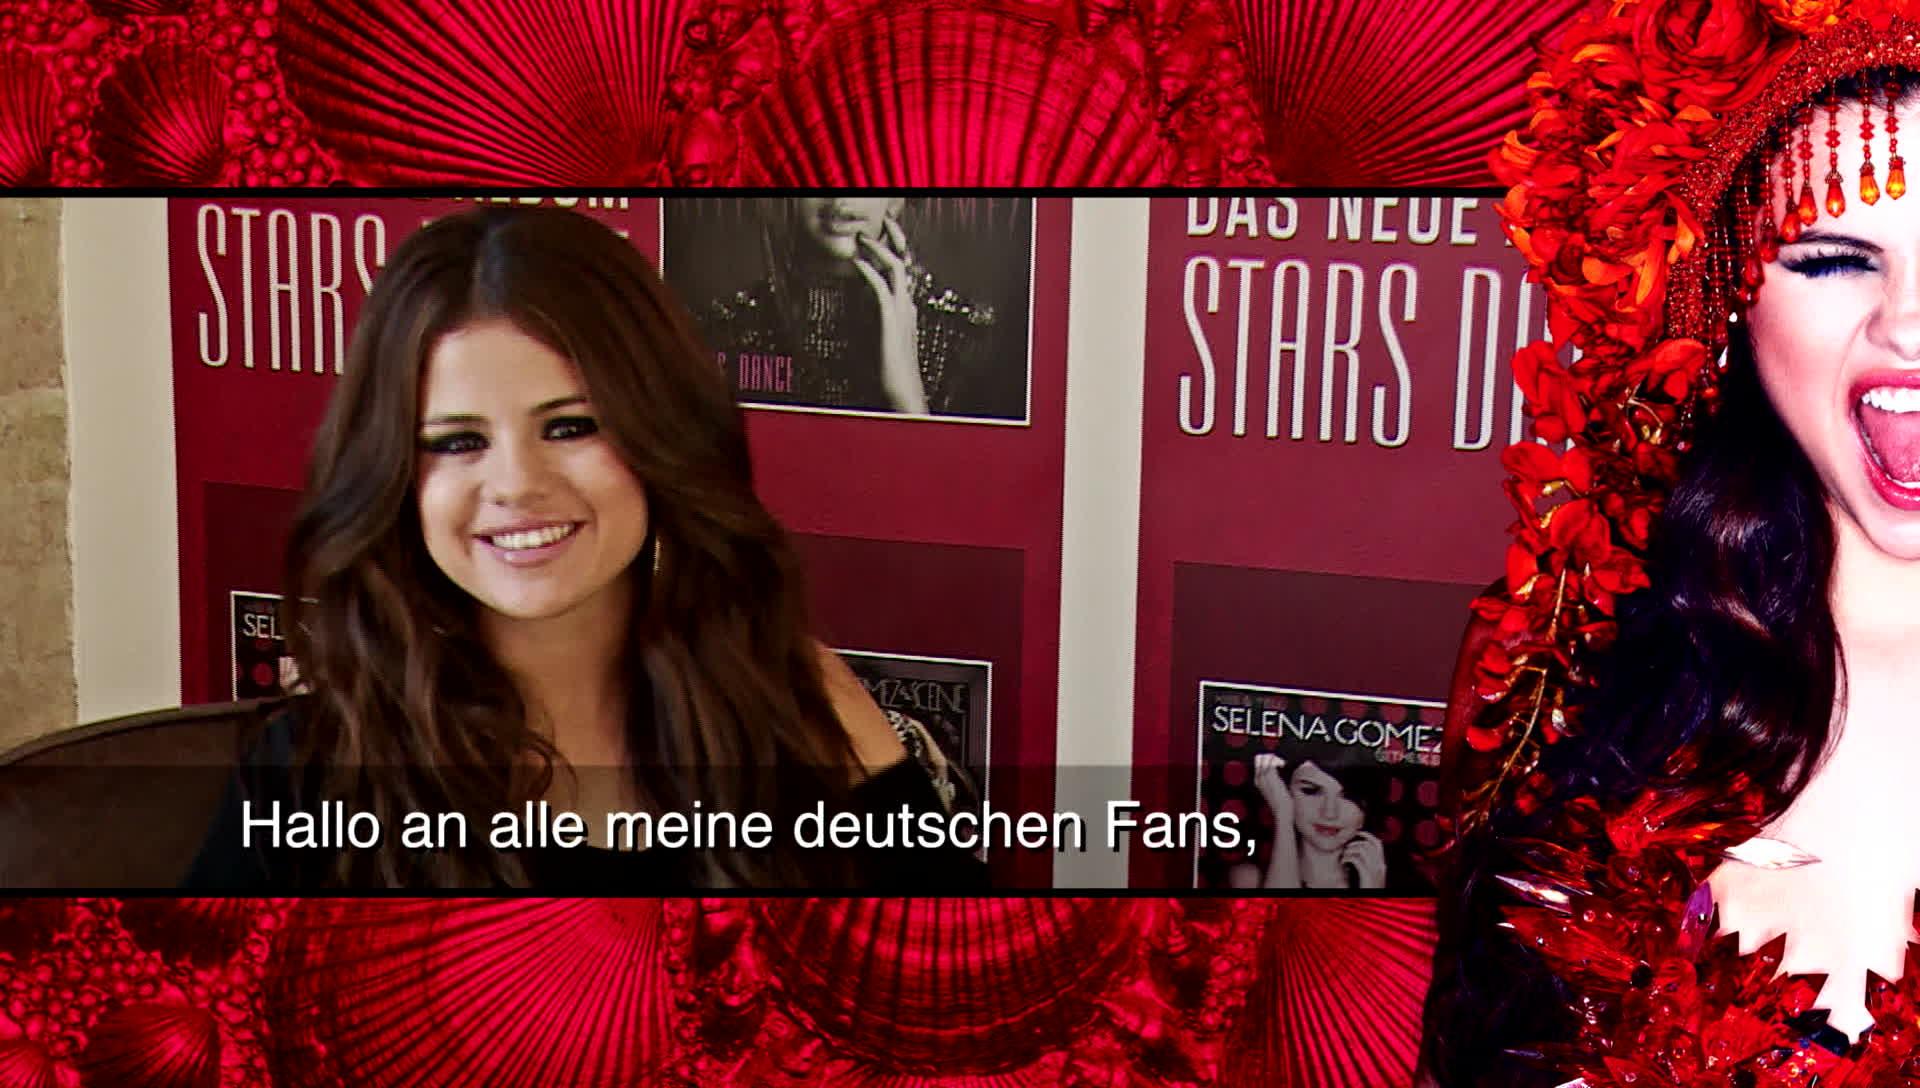 Selena Gomez, Stars Dance Albumtrailer